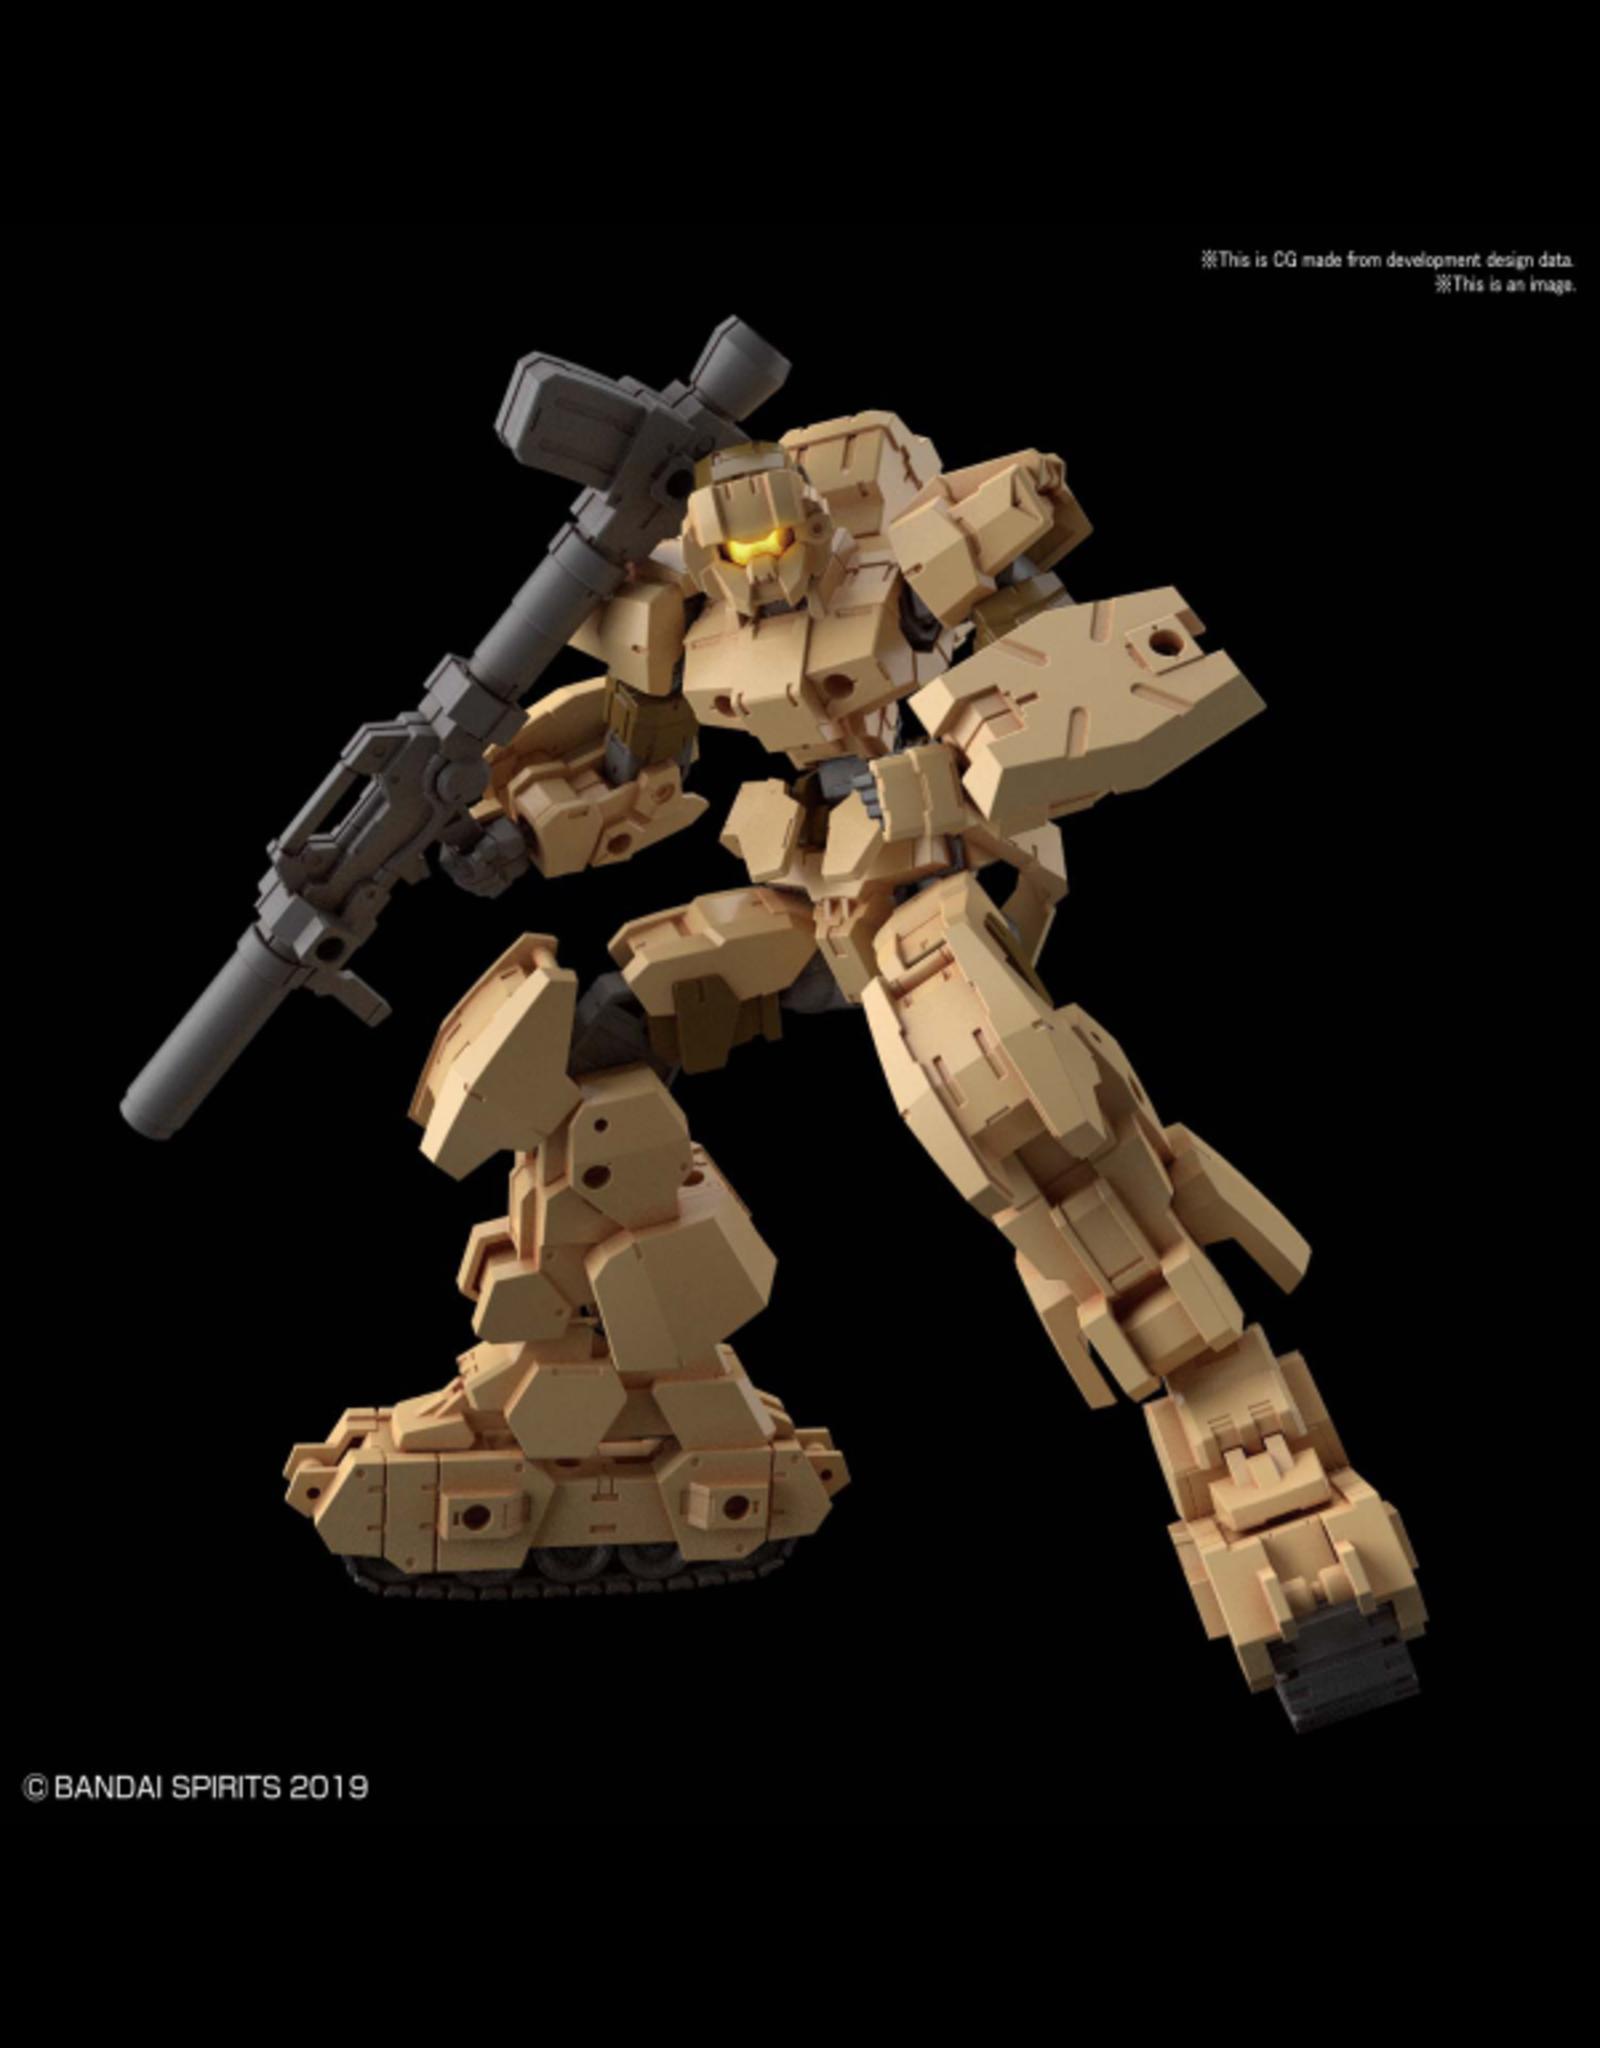 BANDAI 30MM 1/144 eEXM-17 ALTO(GROUND TYPE) [BROWN]